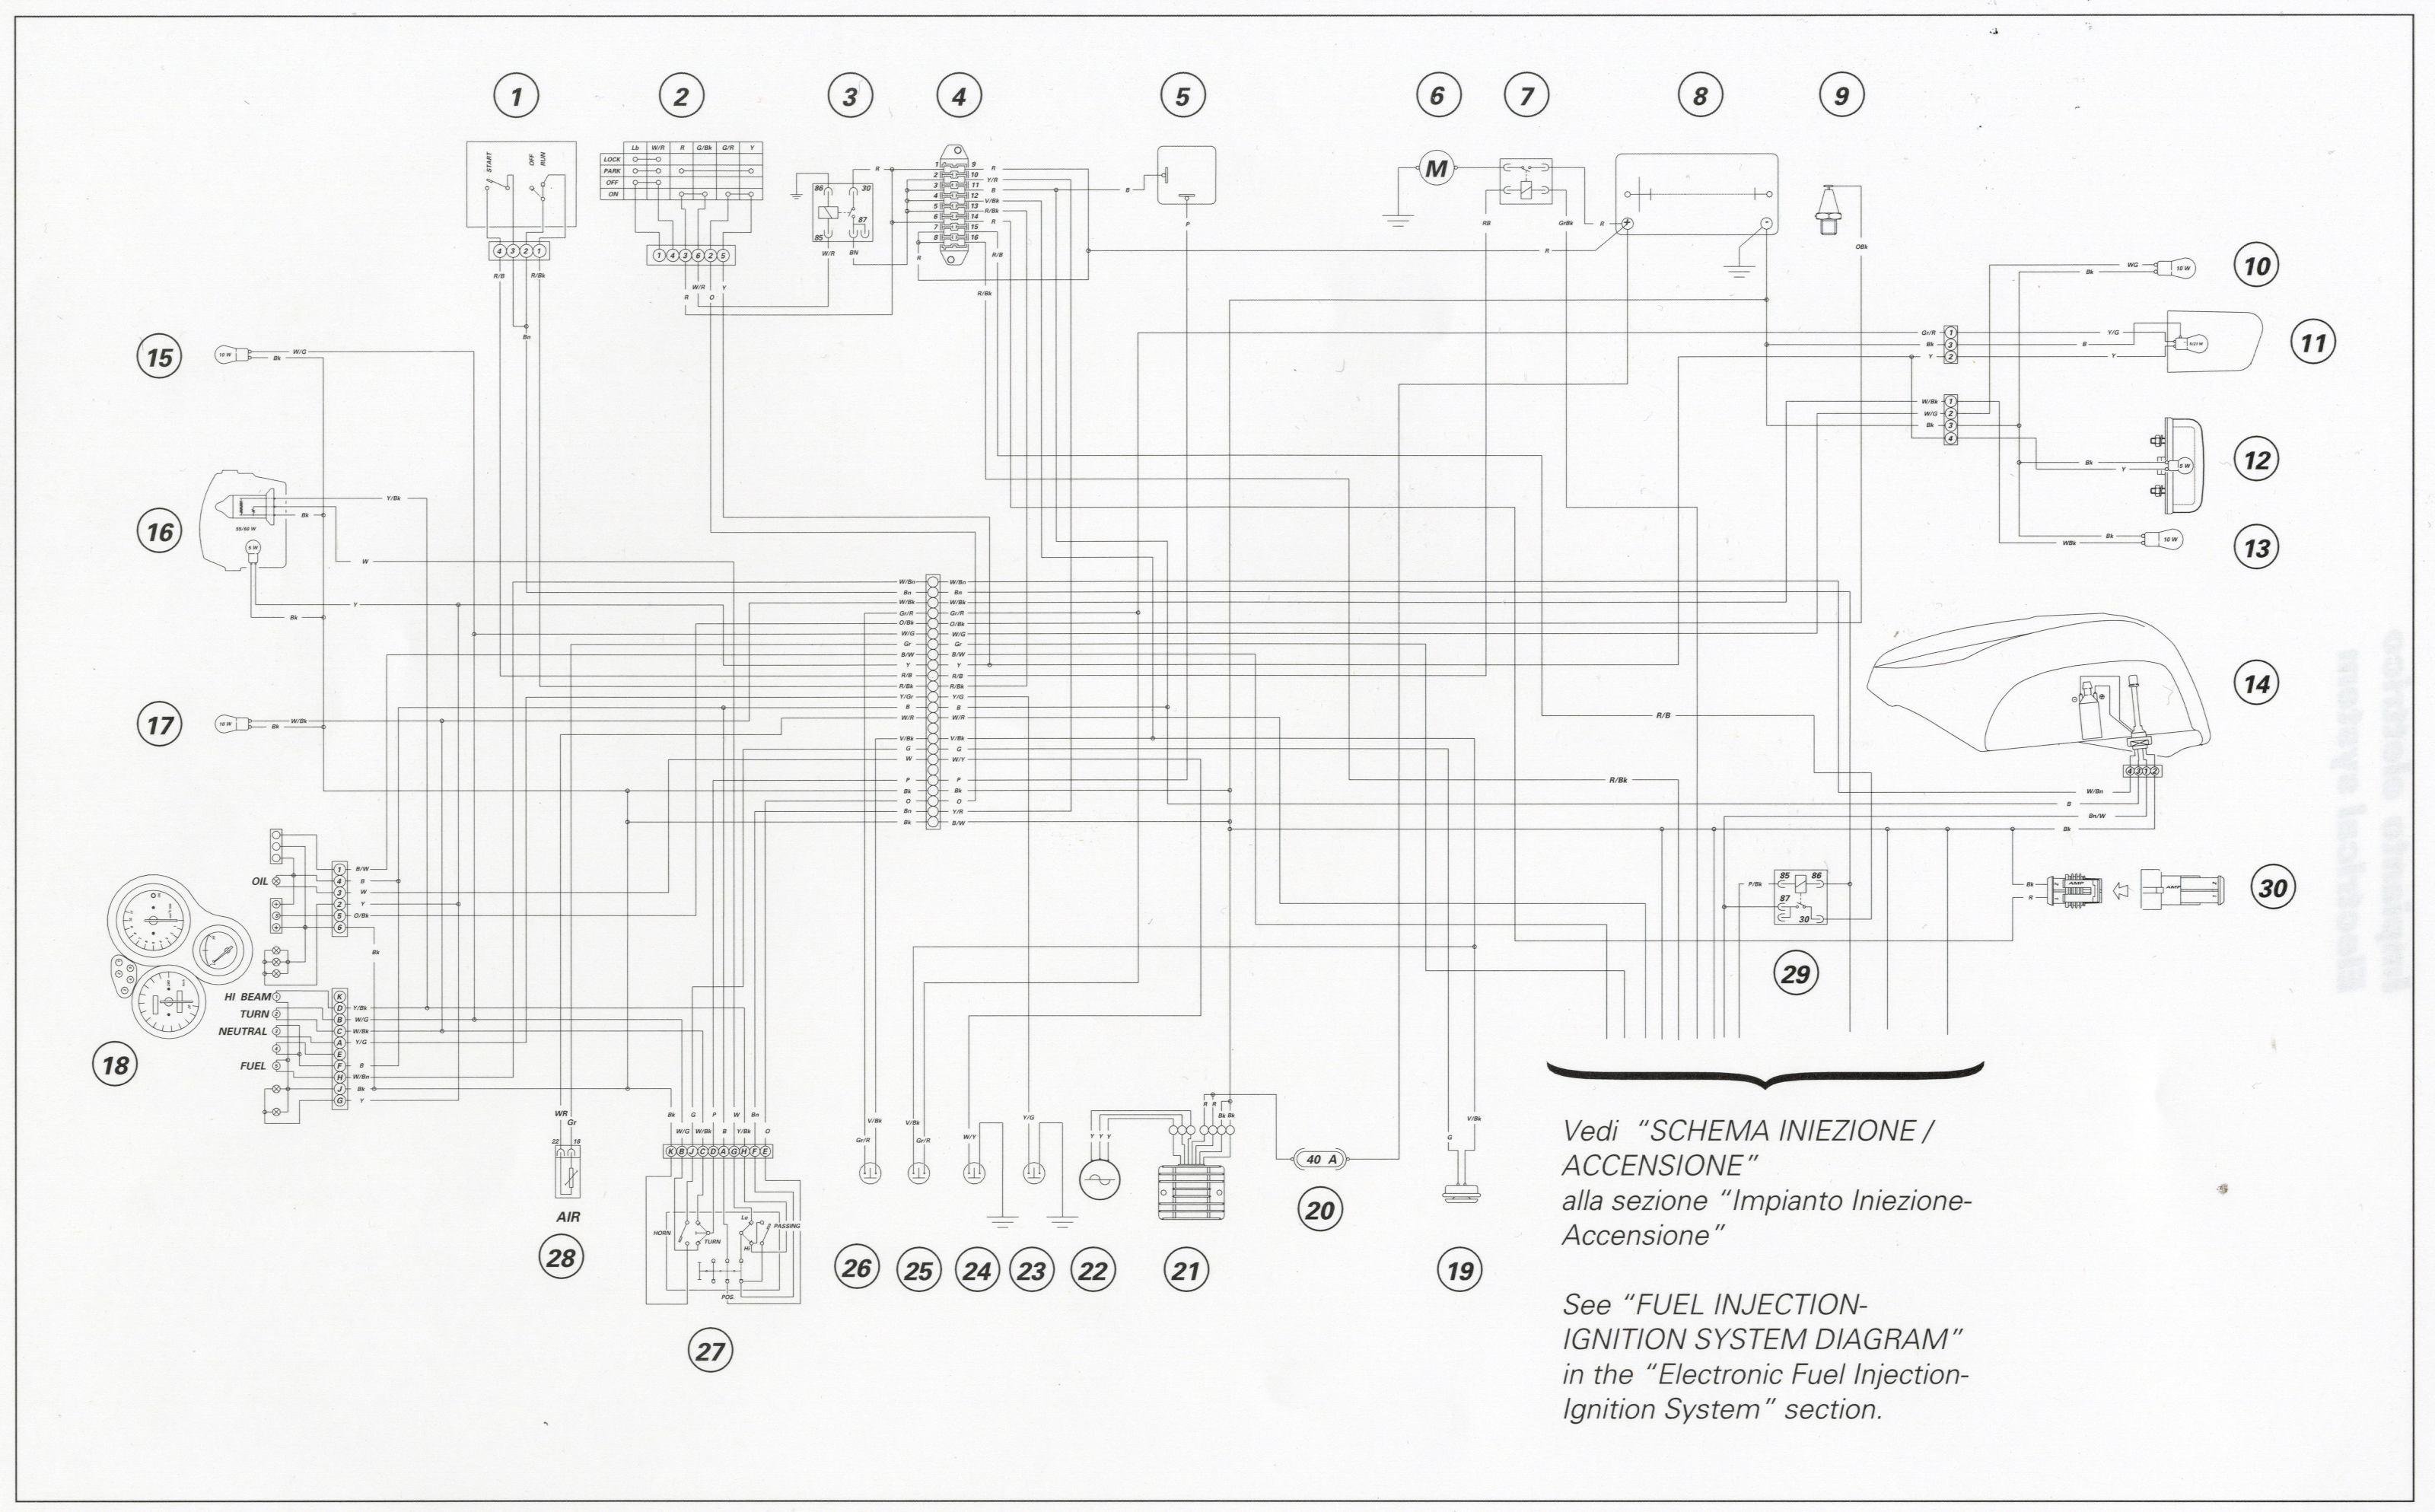 cnc wiring diagram shop cnc plasmahight resolution of shop manual wiring diagram legend wanted ducati ms the cnc wiring diagrams shop